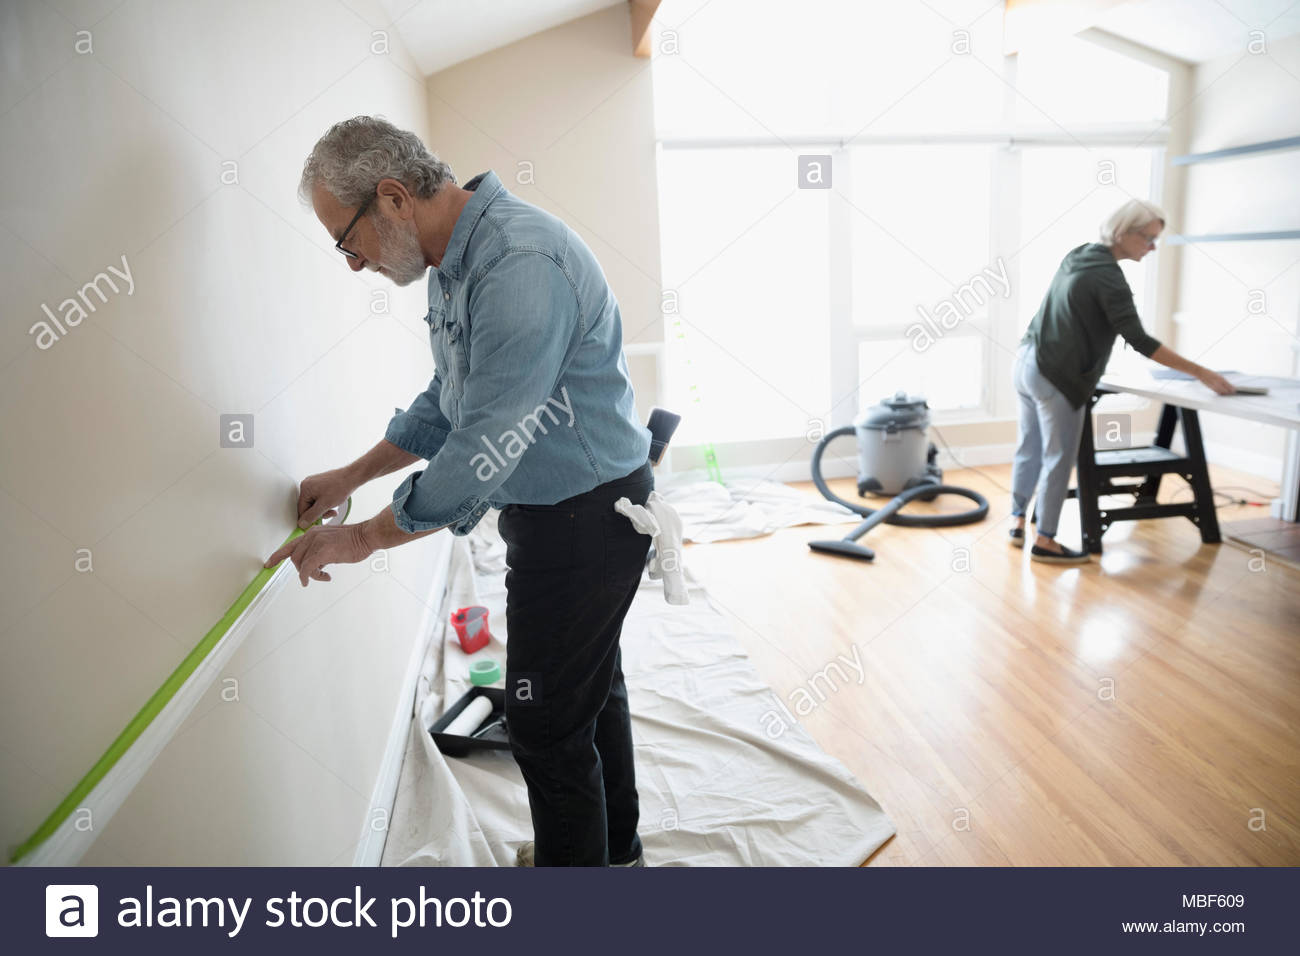 Senior man taping, preparing to paint chair rail in living room, DIY - Stock Image